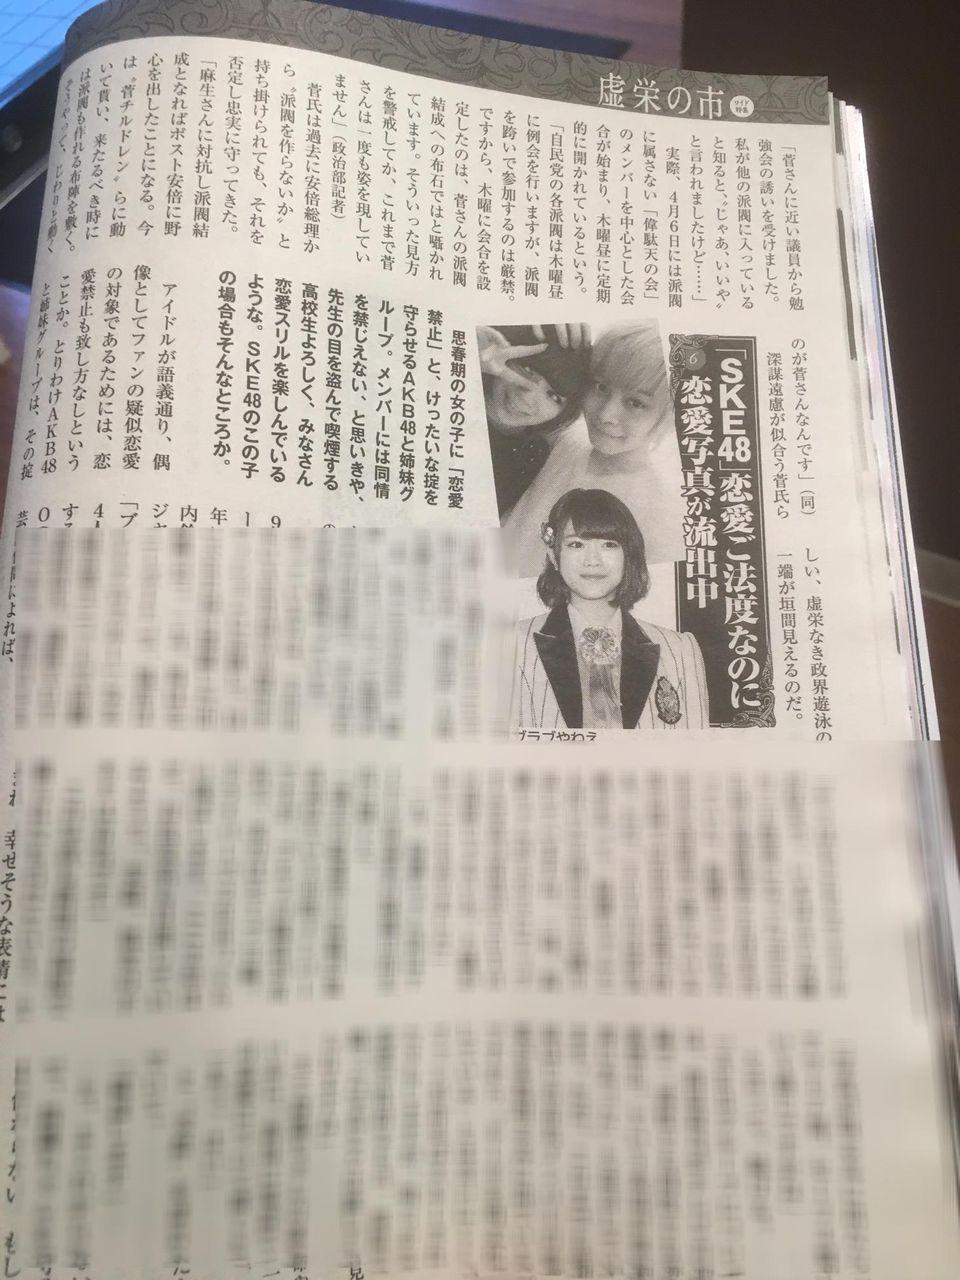 【SKE48】山内鈴蘭の処分は何が妥当なのか?【新潮砲】